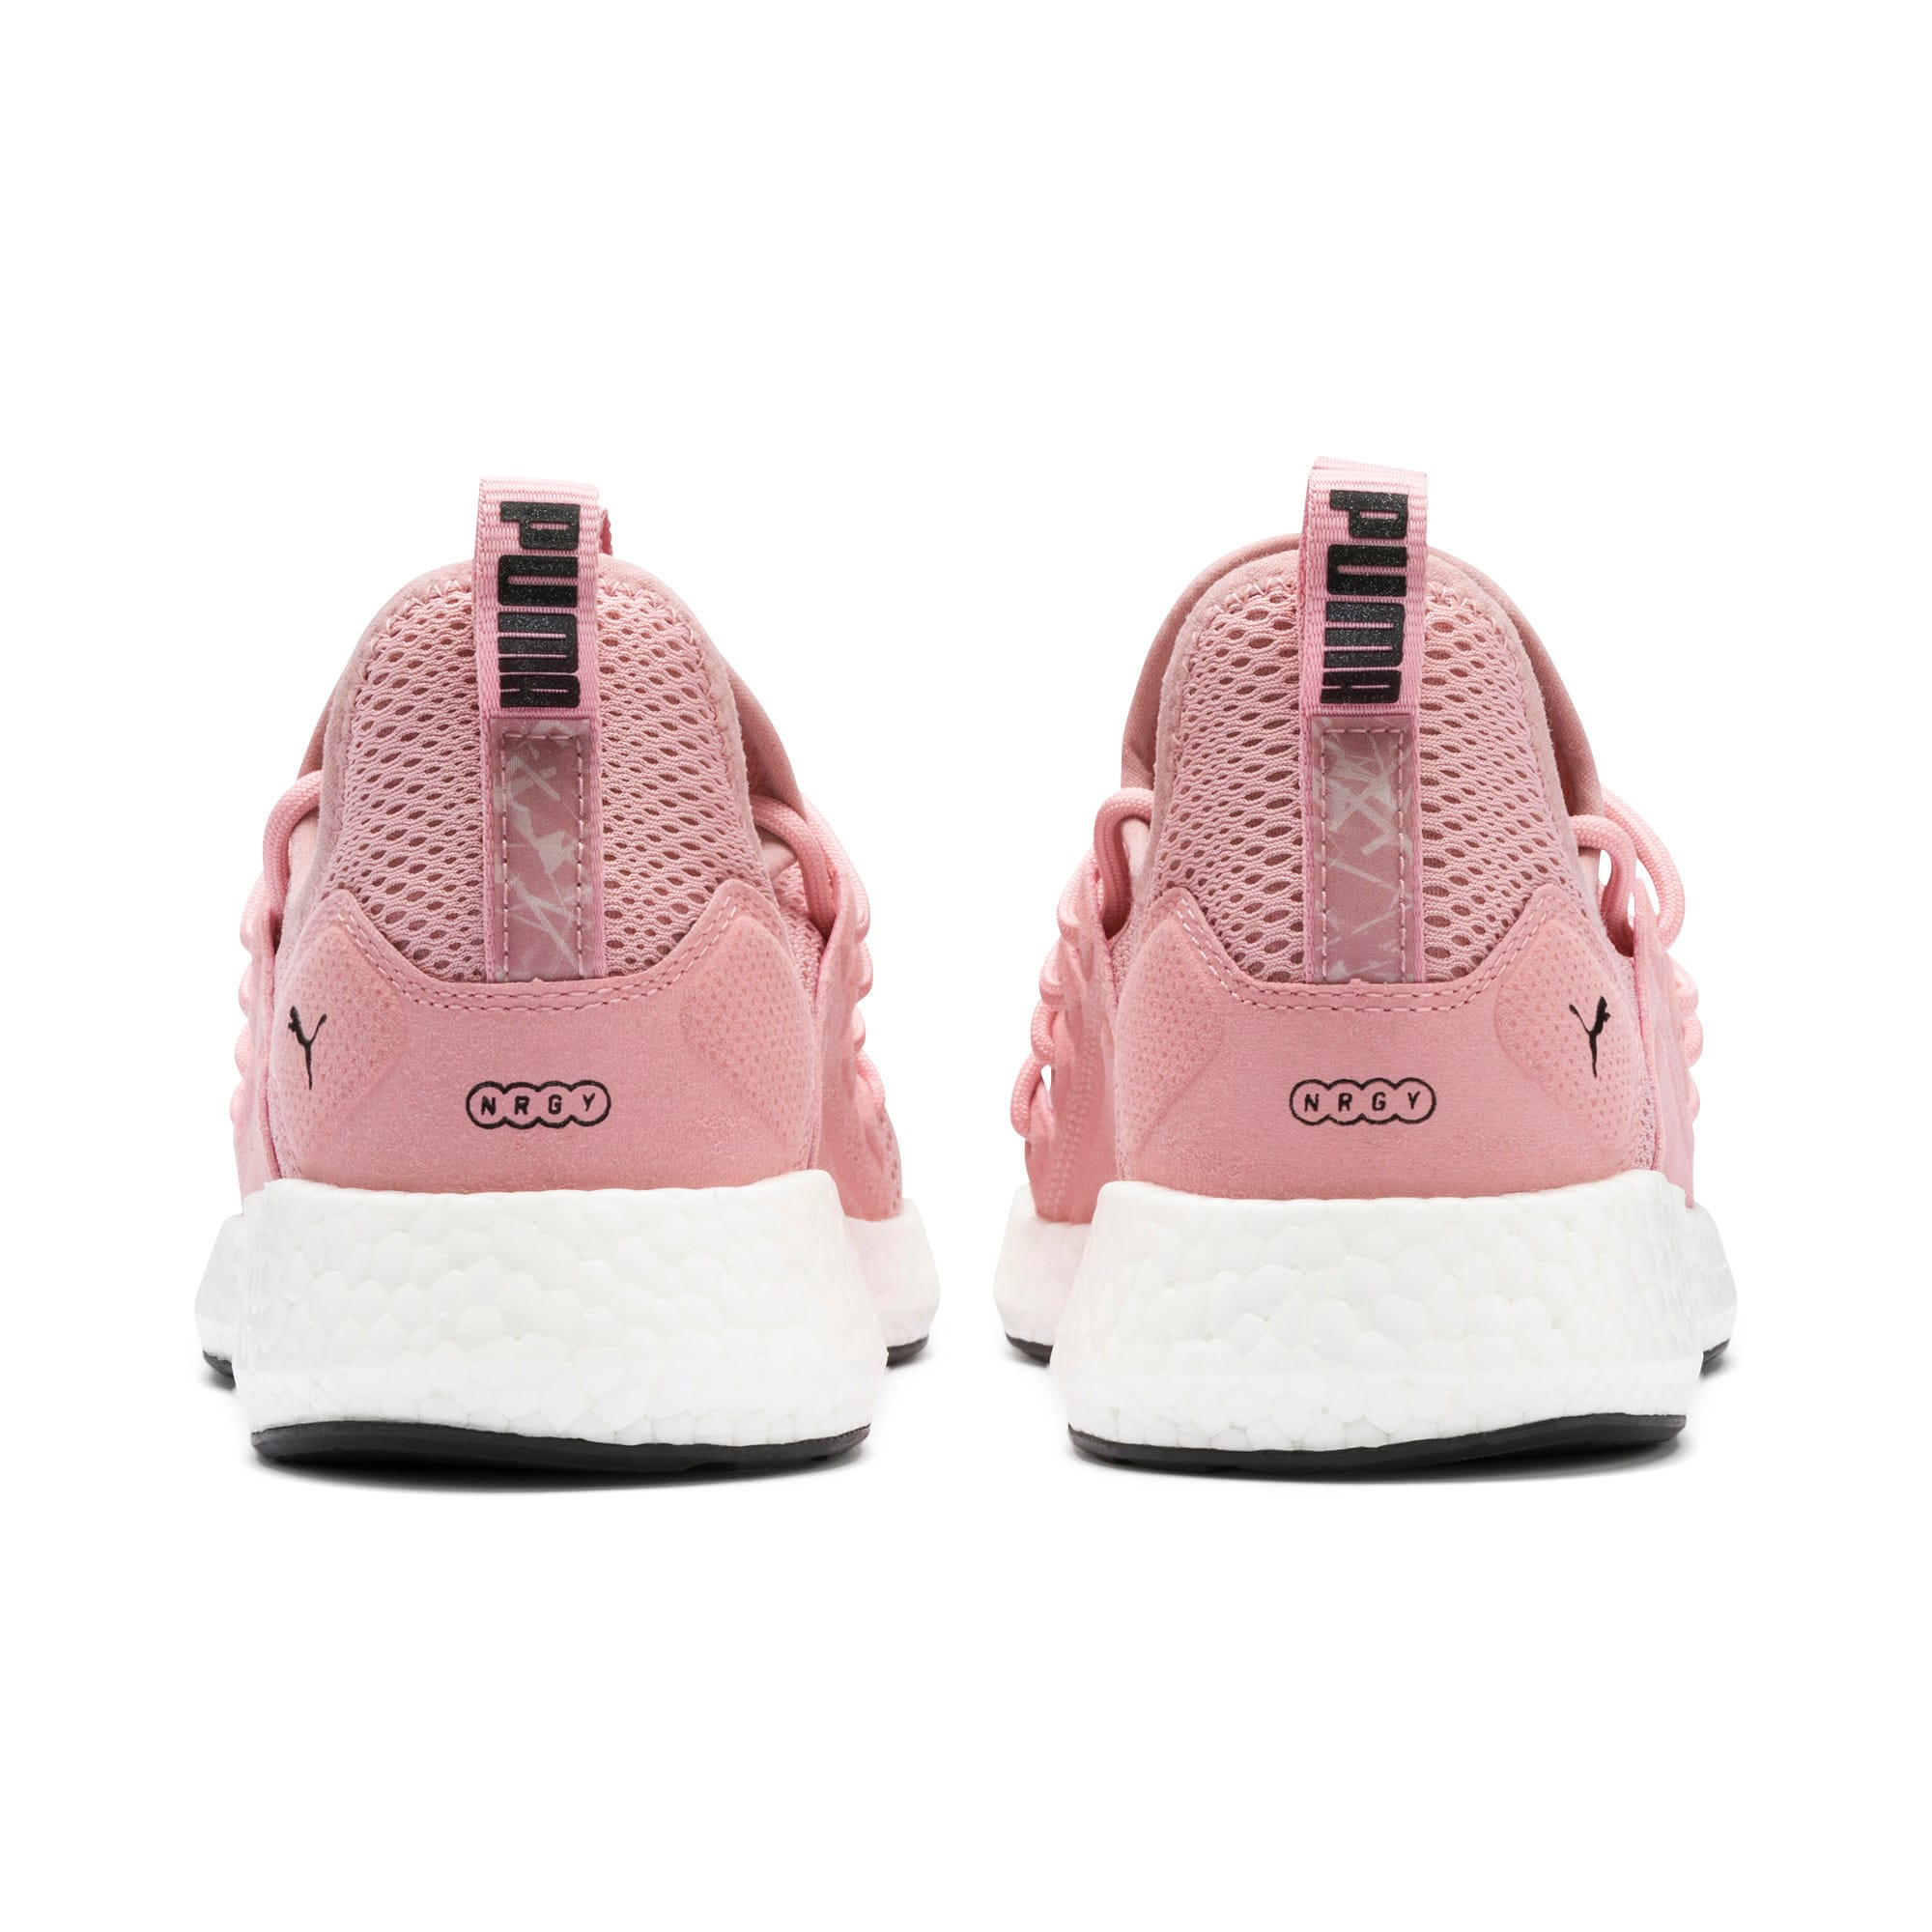 Thumbnail 4 of NRGY Neko Shift Women's Running Shoes, Bridal Rose-Puma White, medium